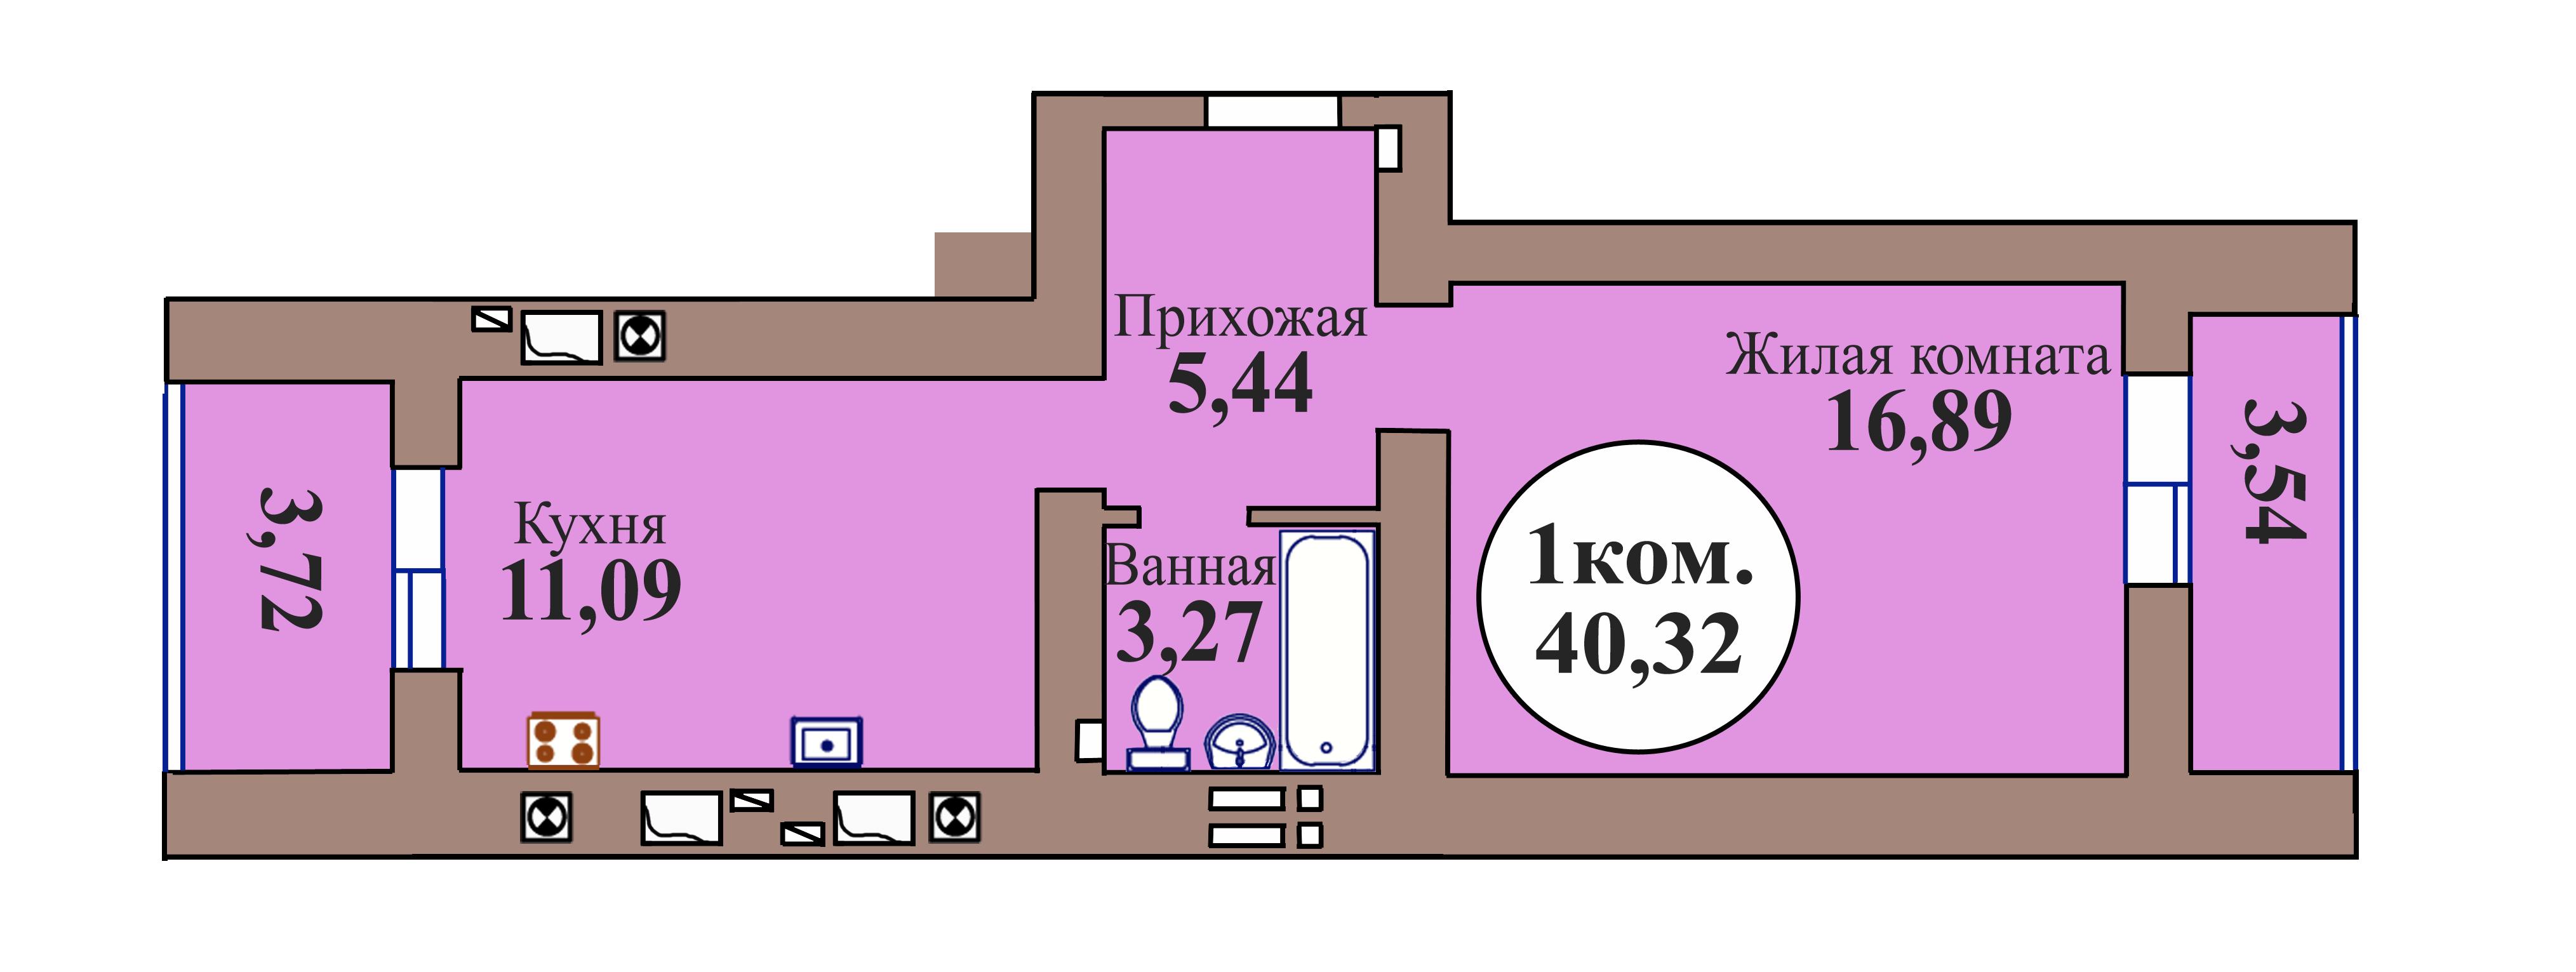 1-комн. кв. по пер. Калининградский, 5 кв. 26 в Калининграде